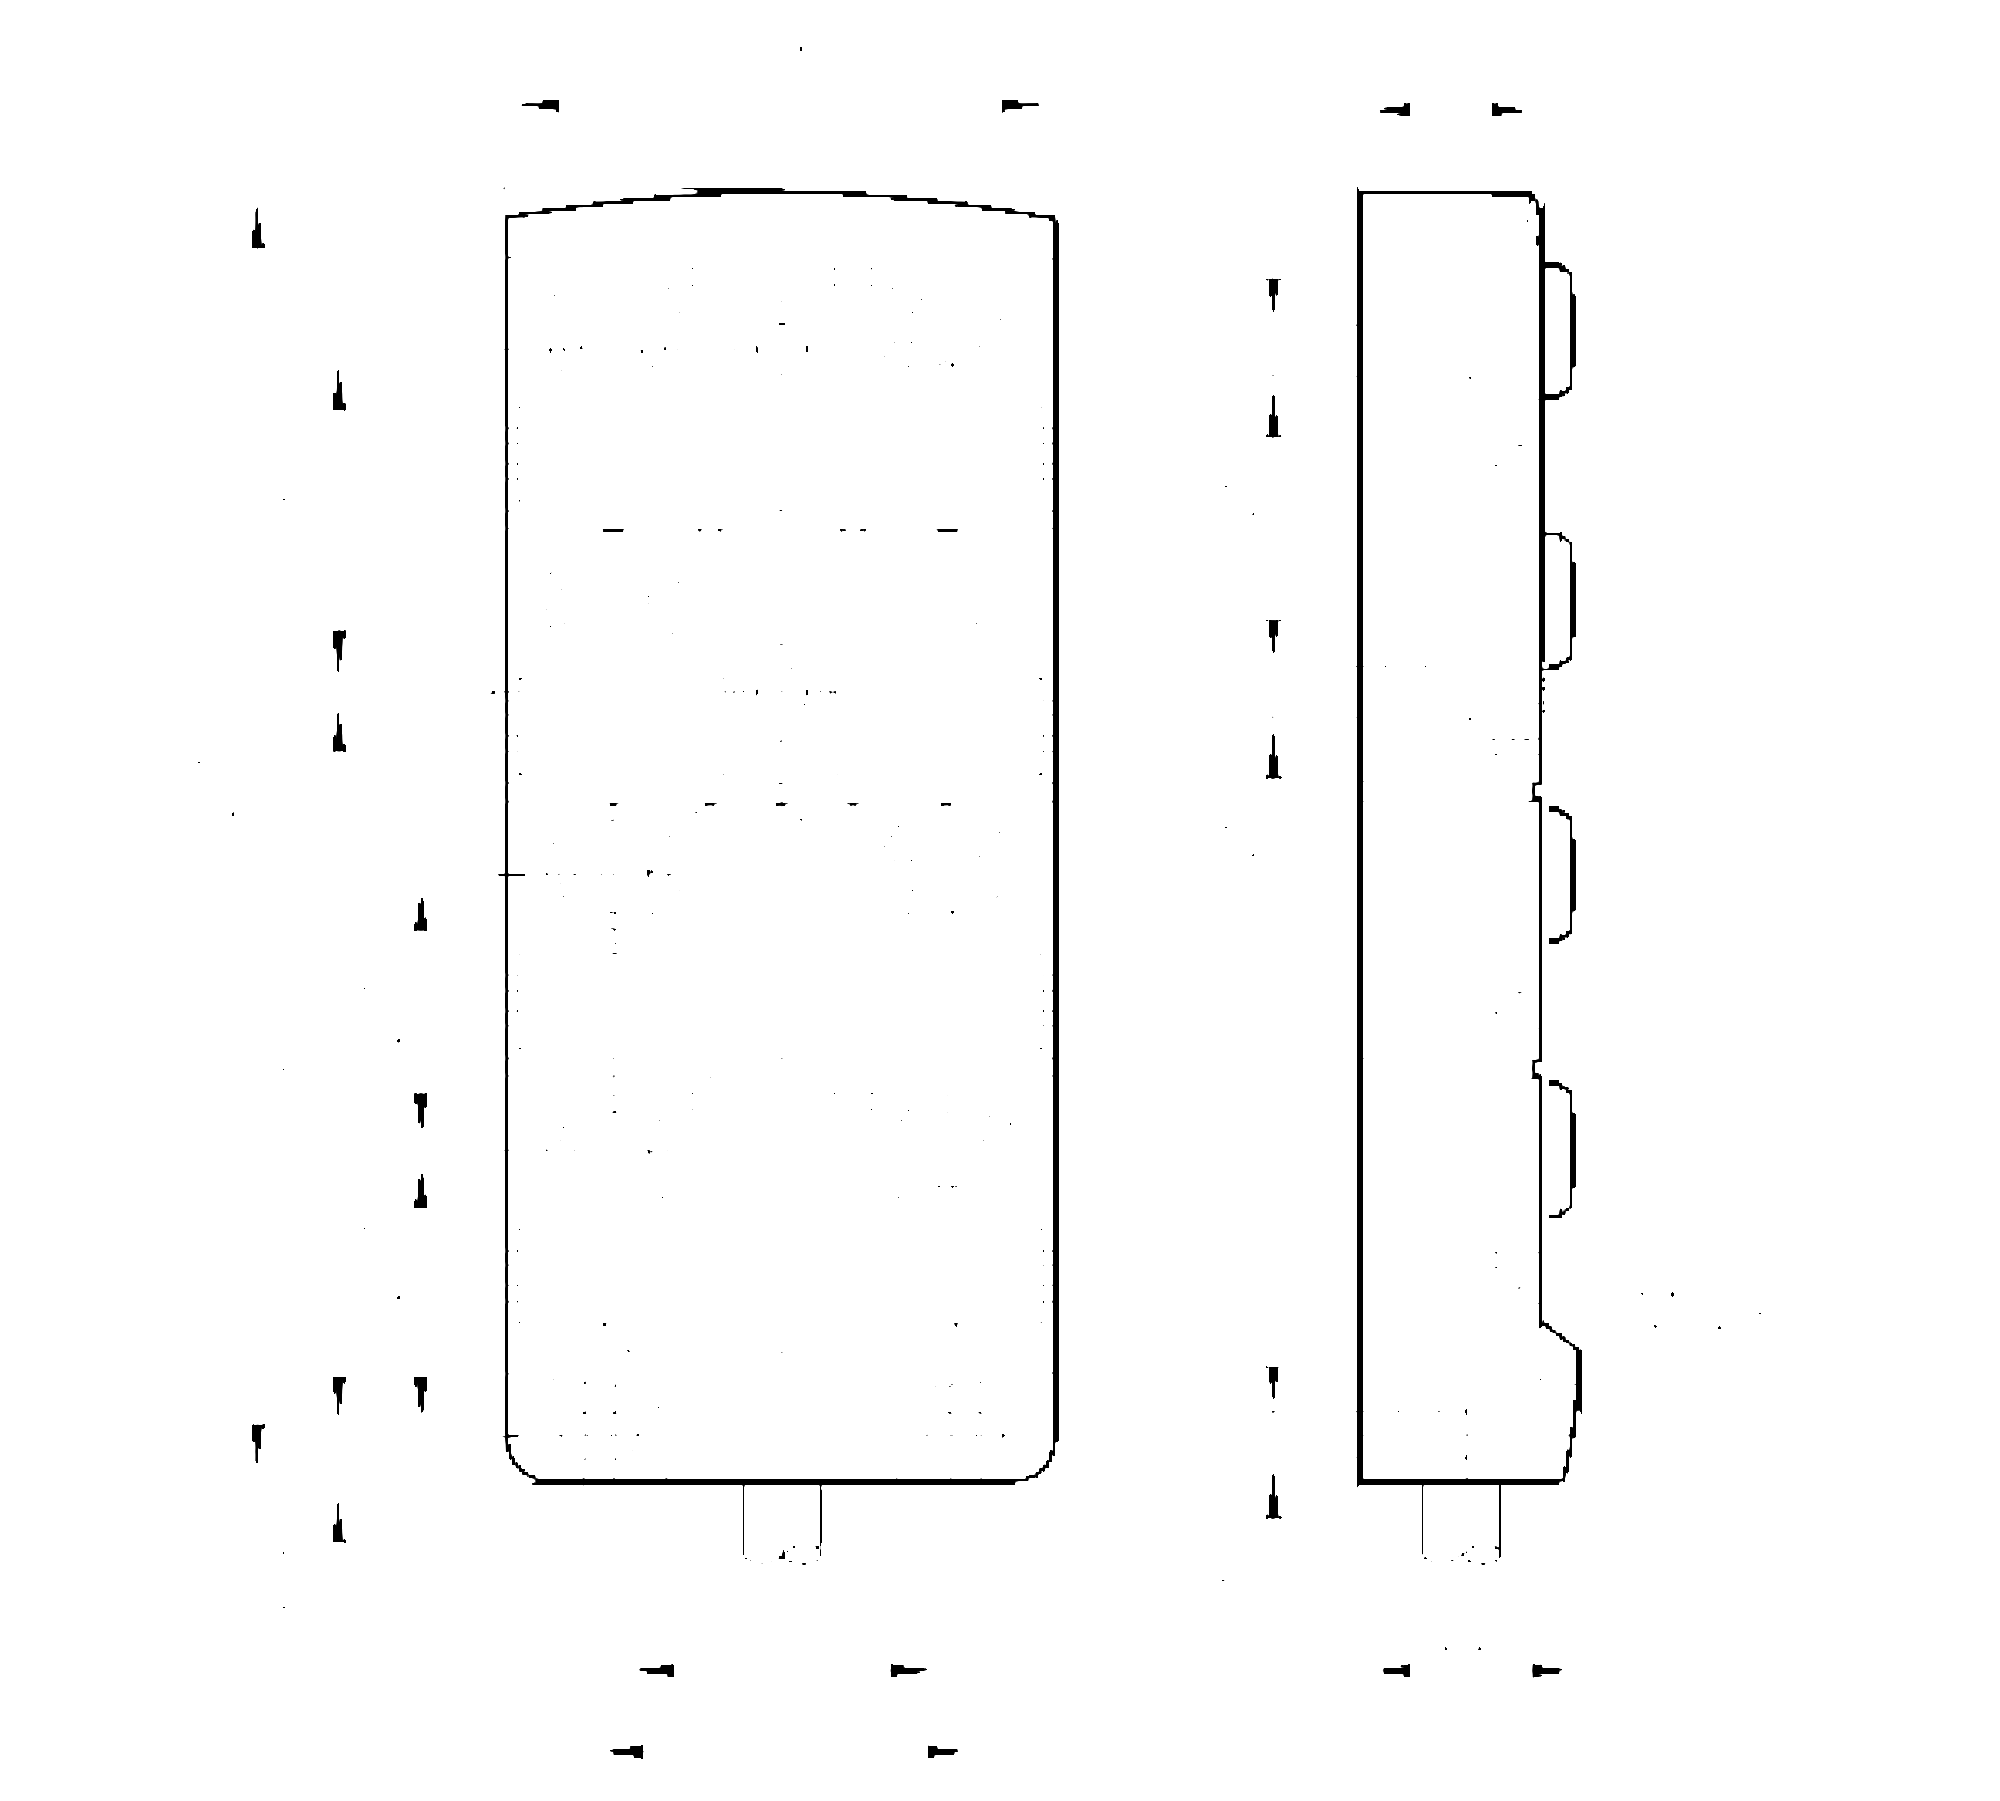 ebc023 - wiring block